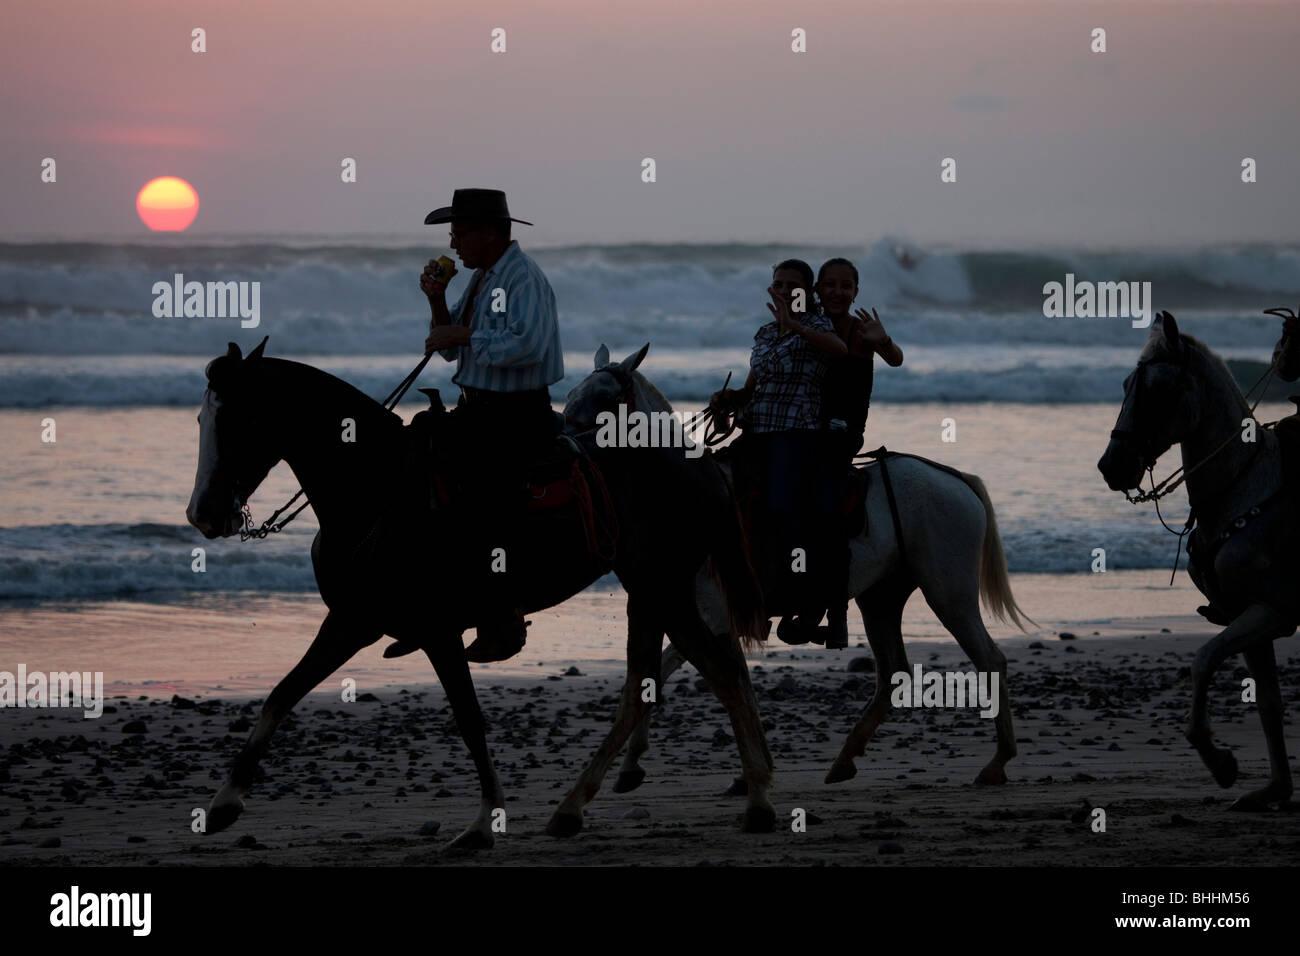 Paseos a caballo en la Playa Carmen, Puntarenas, Costa Rica Foto de stock